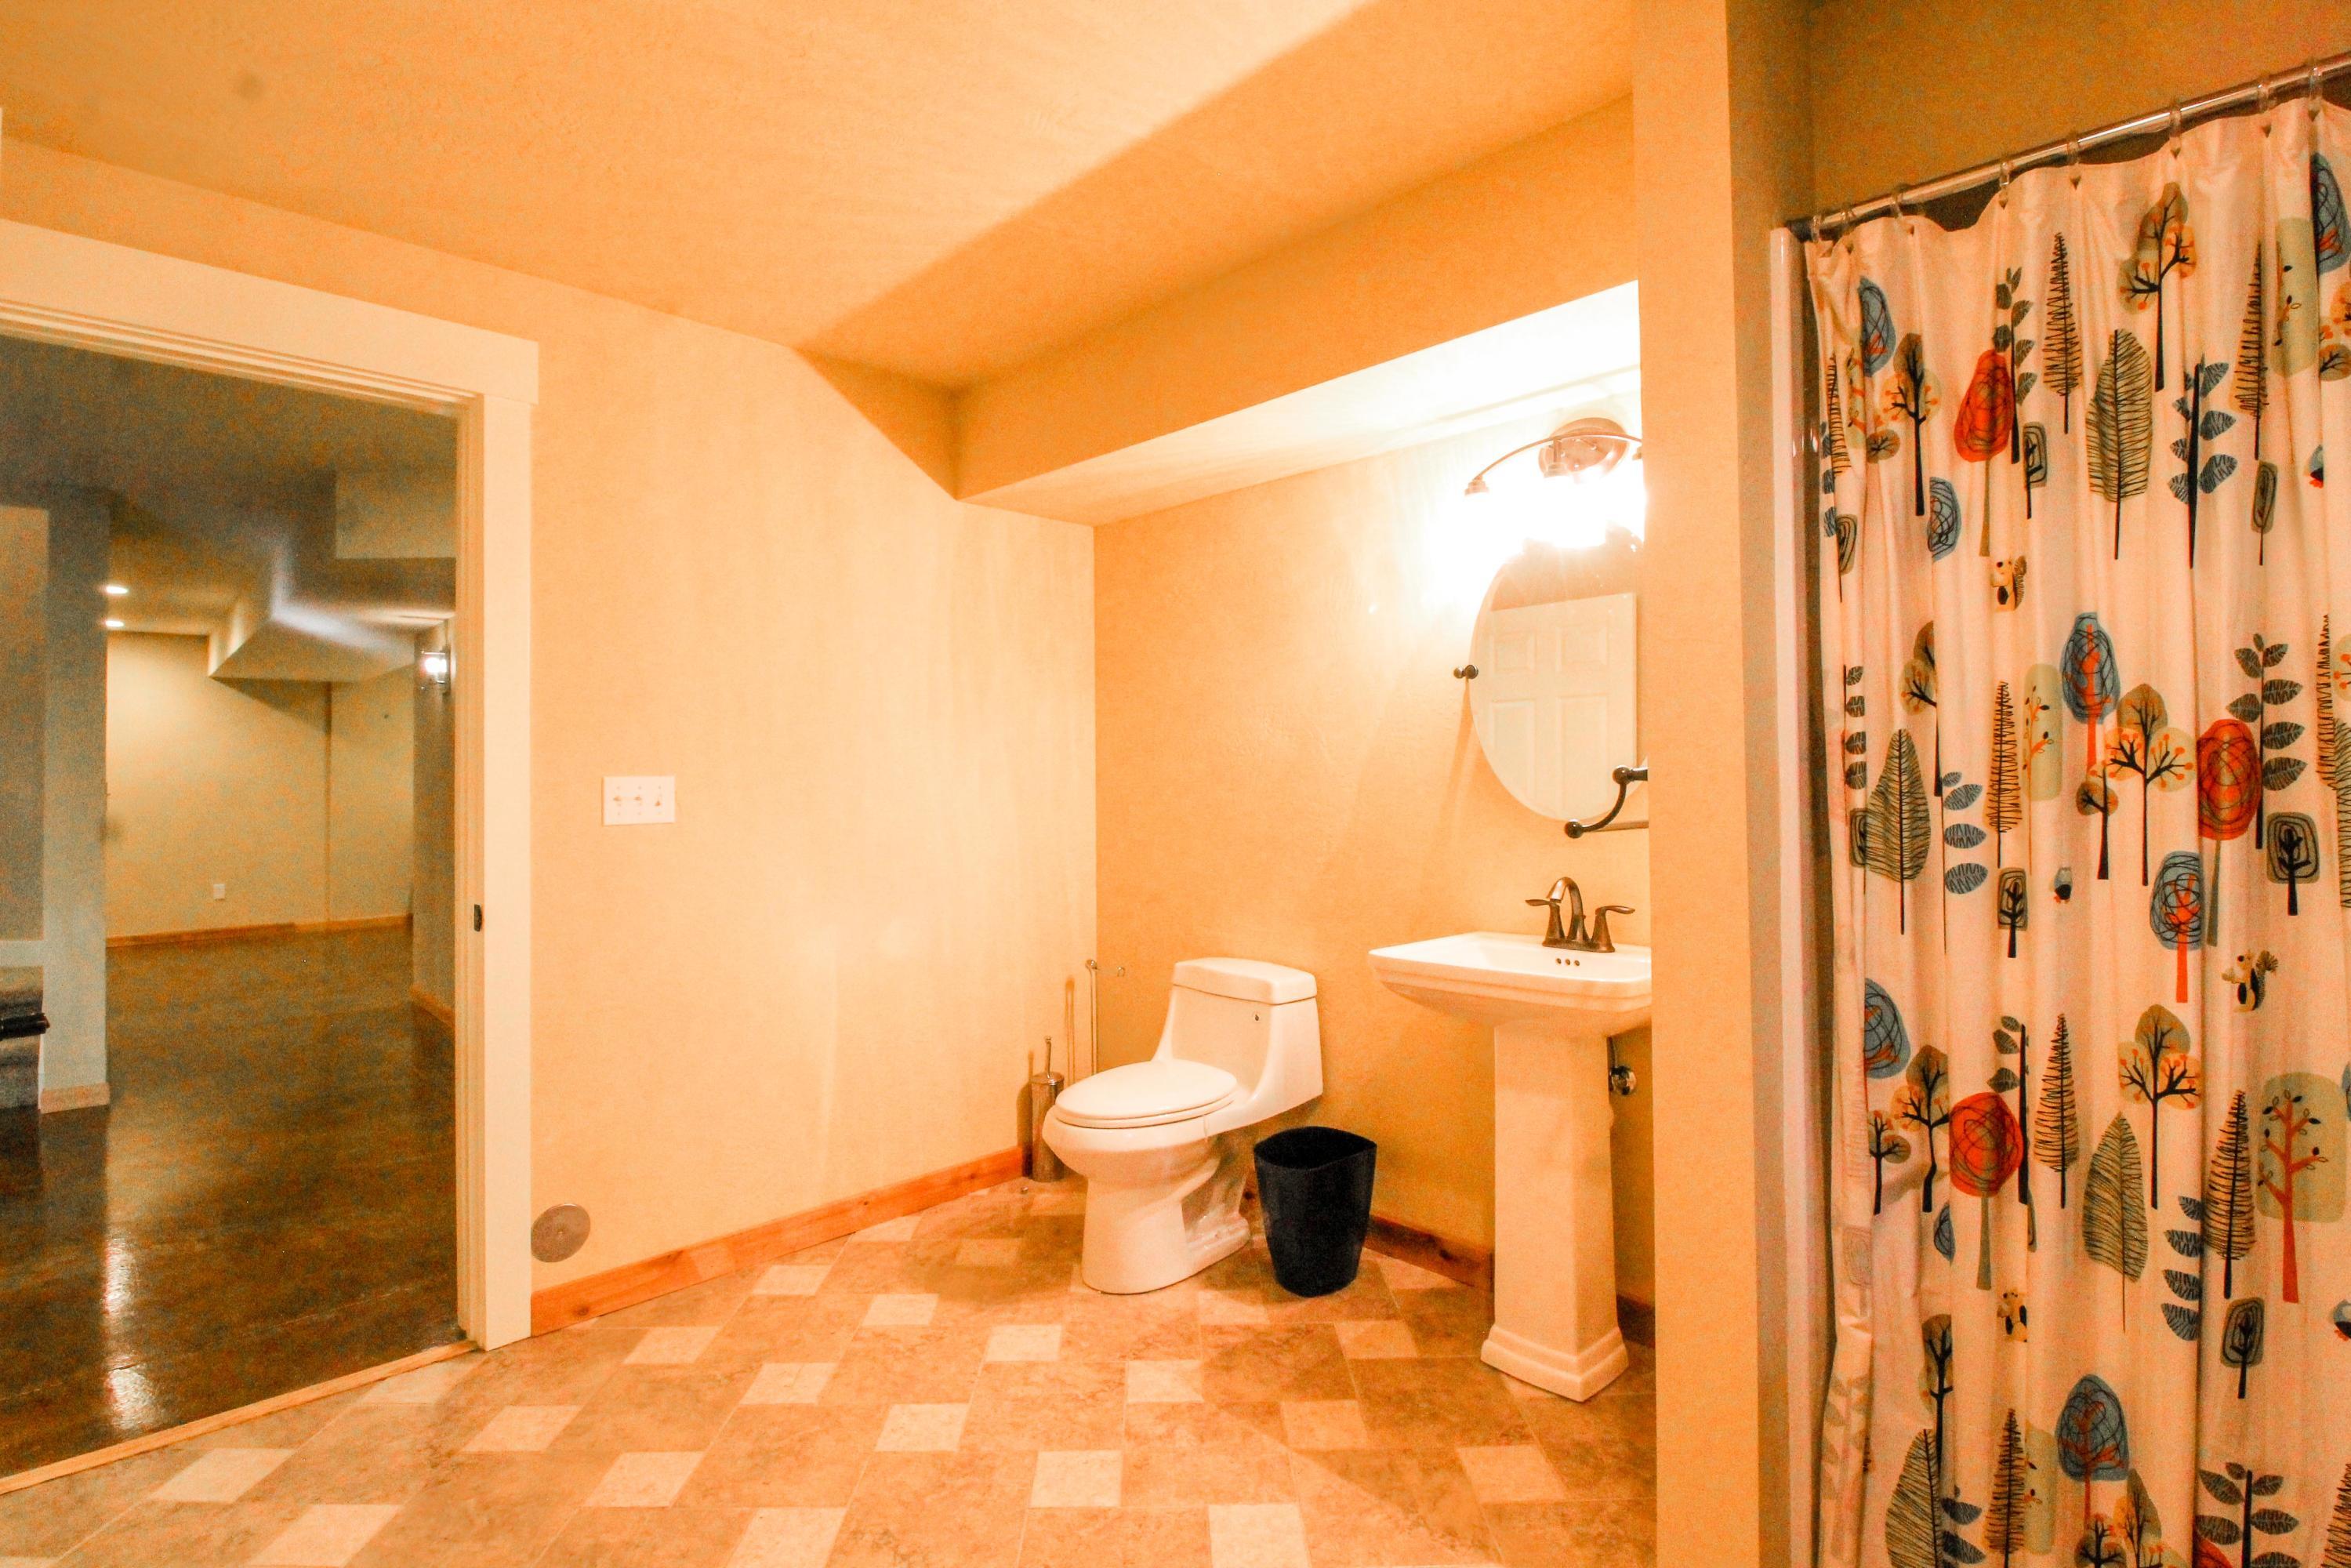 90 Irish Bend - Lower 3/4 Bathroom